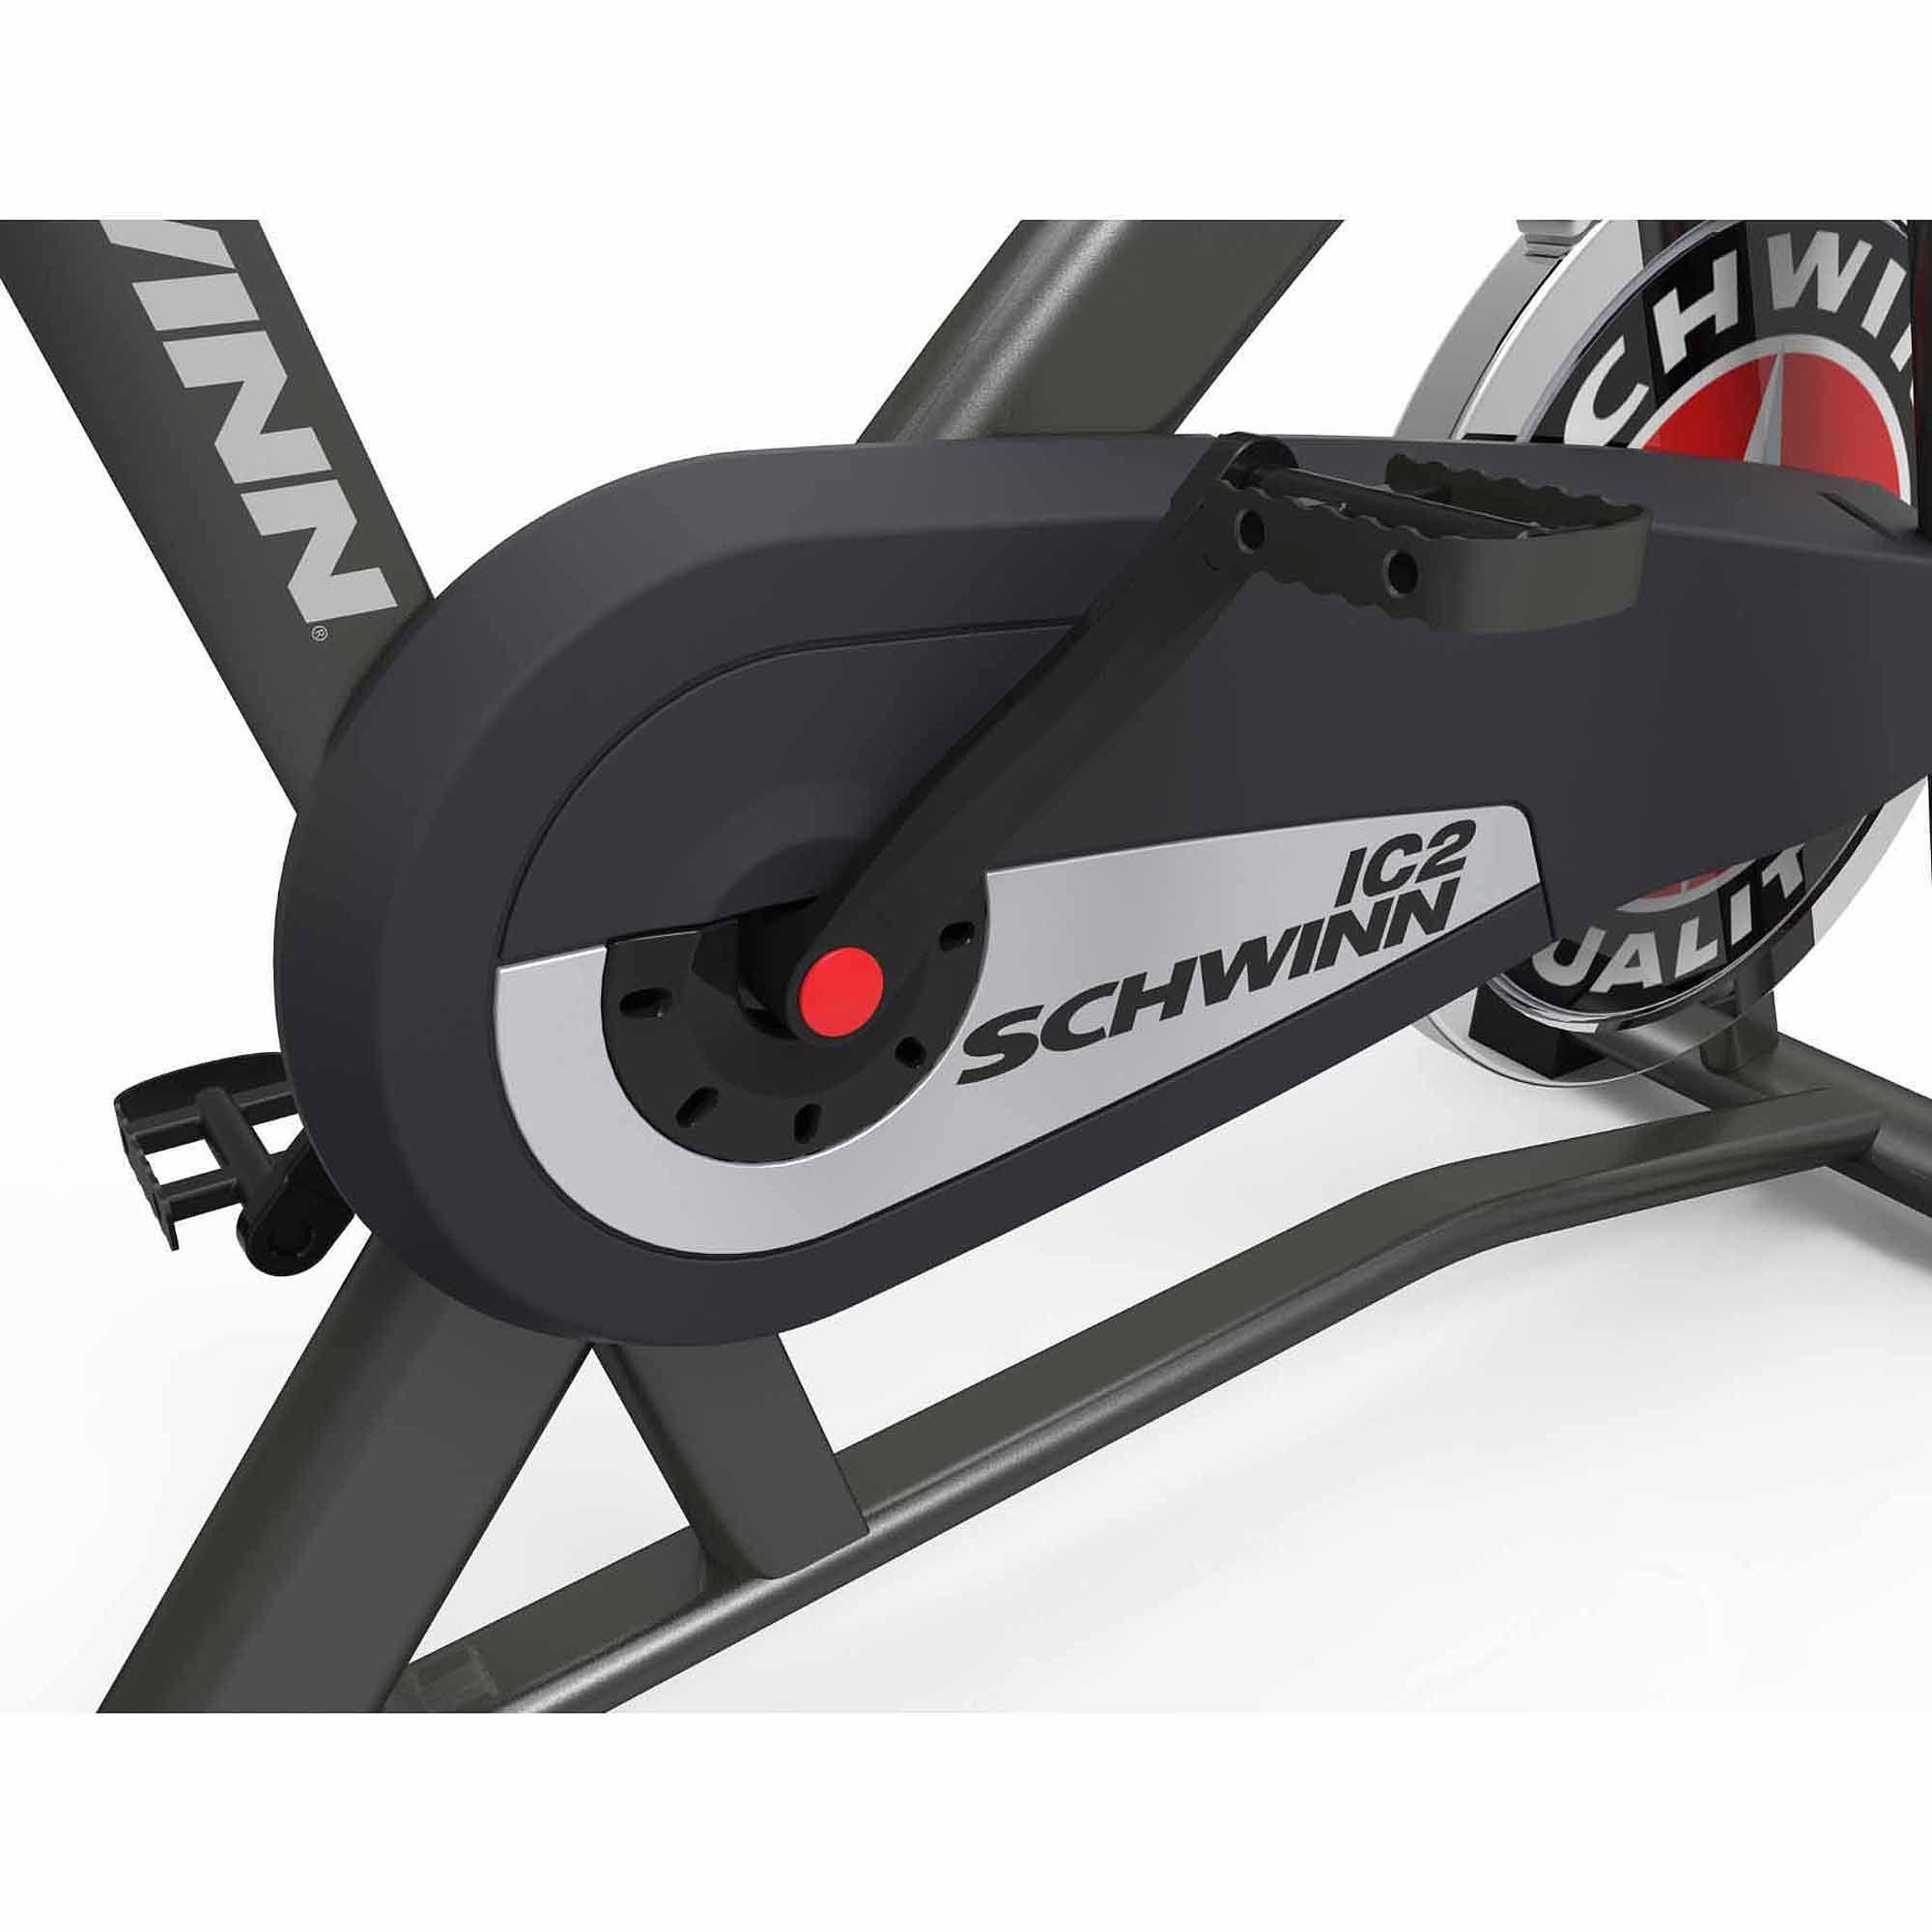 Schwinn Ic2 Indoor Cycling Bike Price